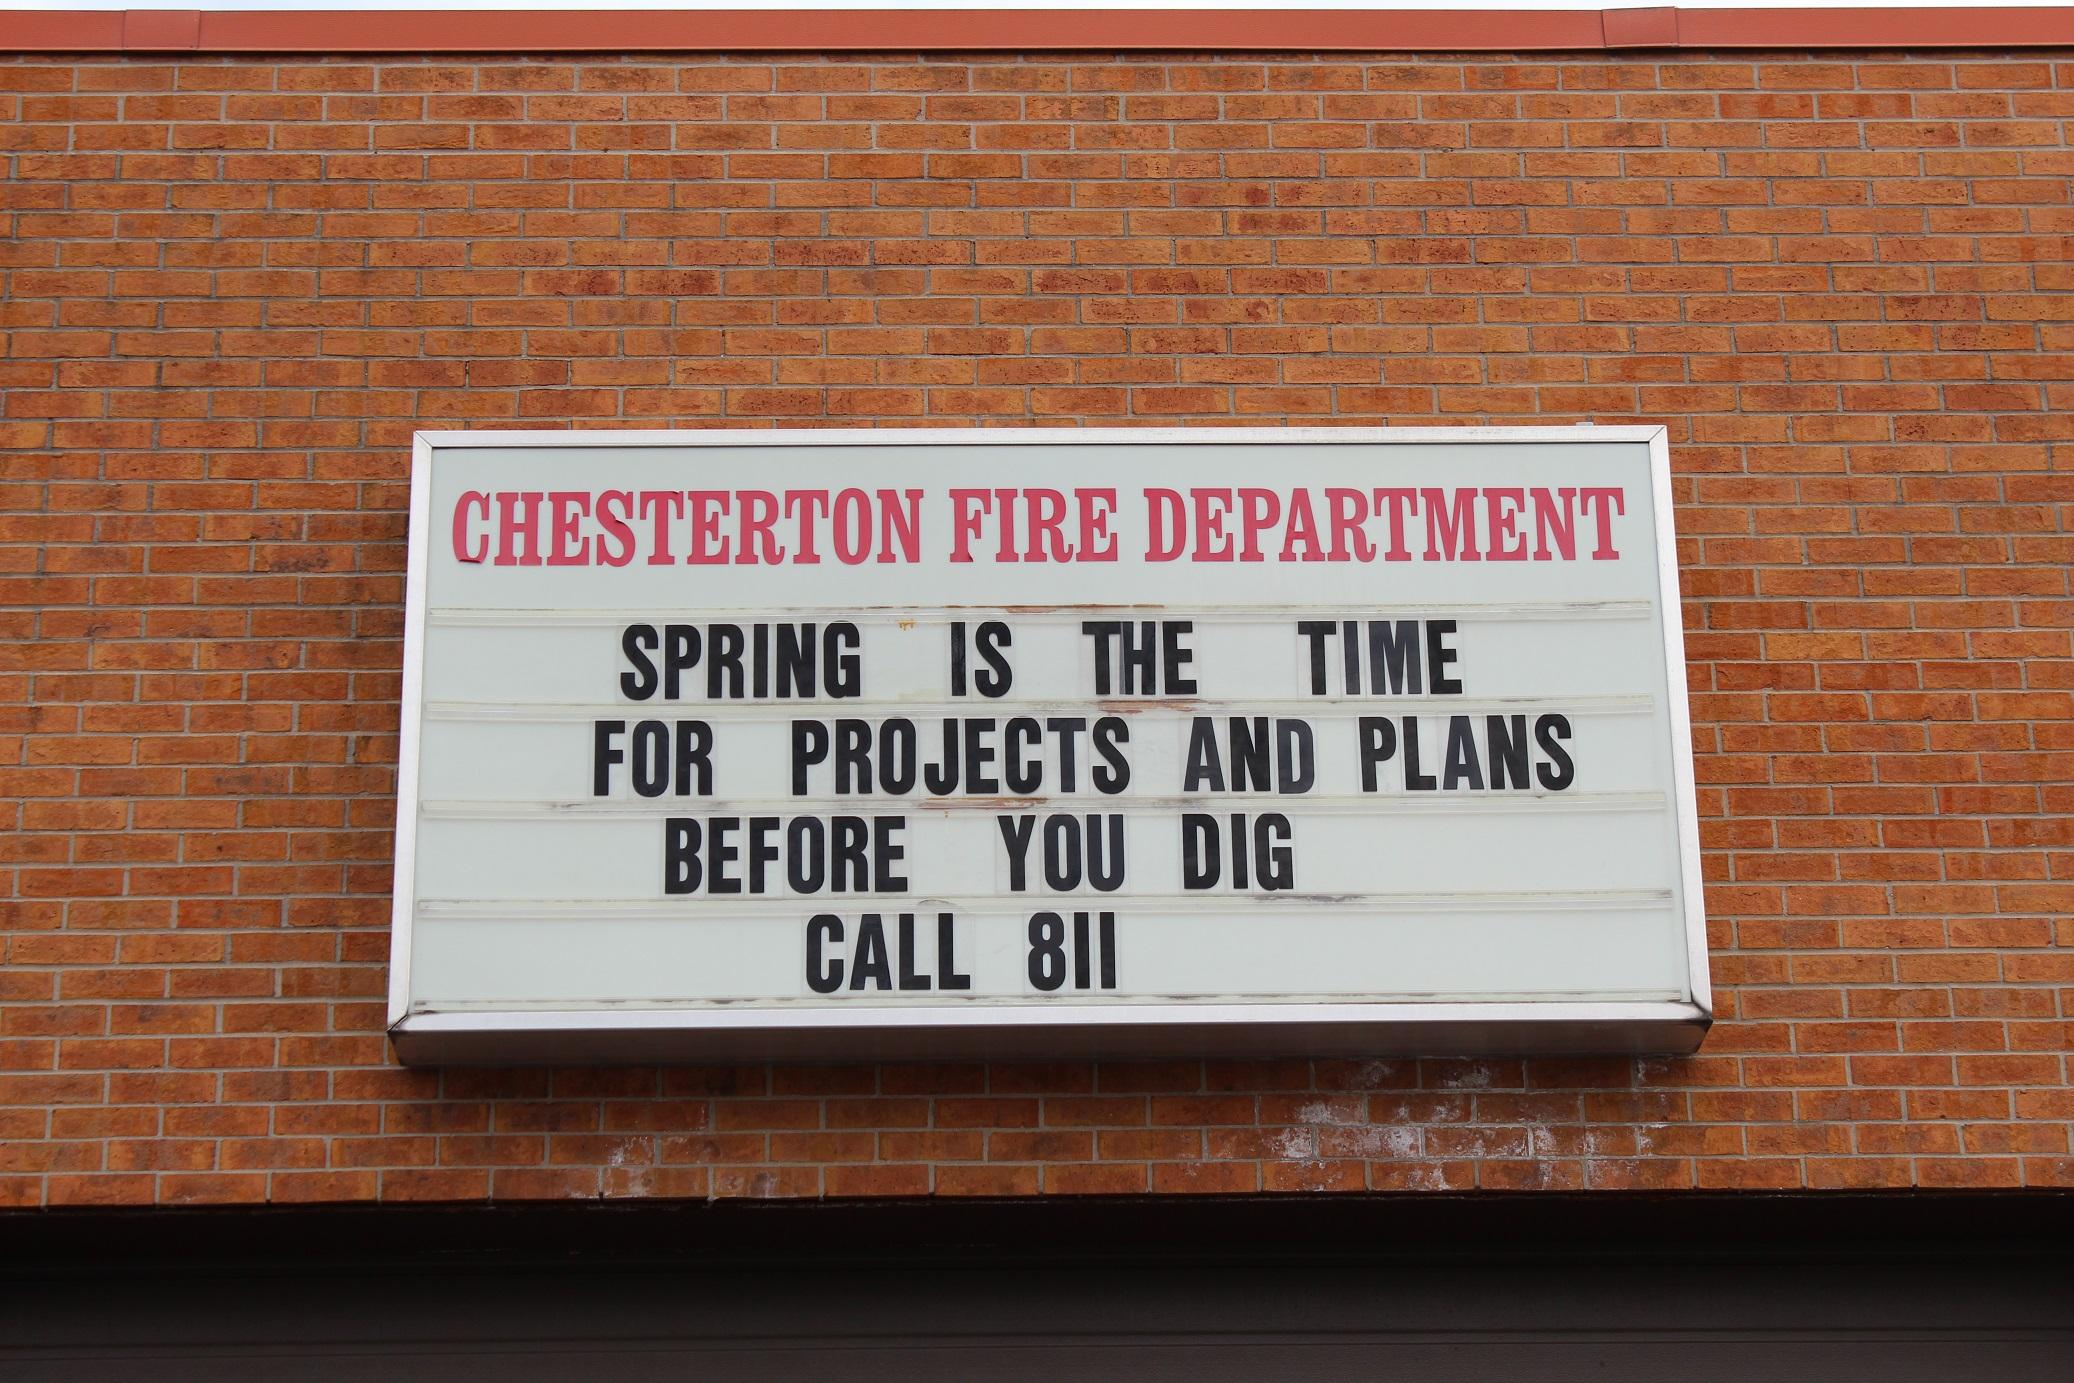 Chesterton Fire Department